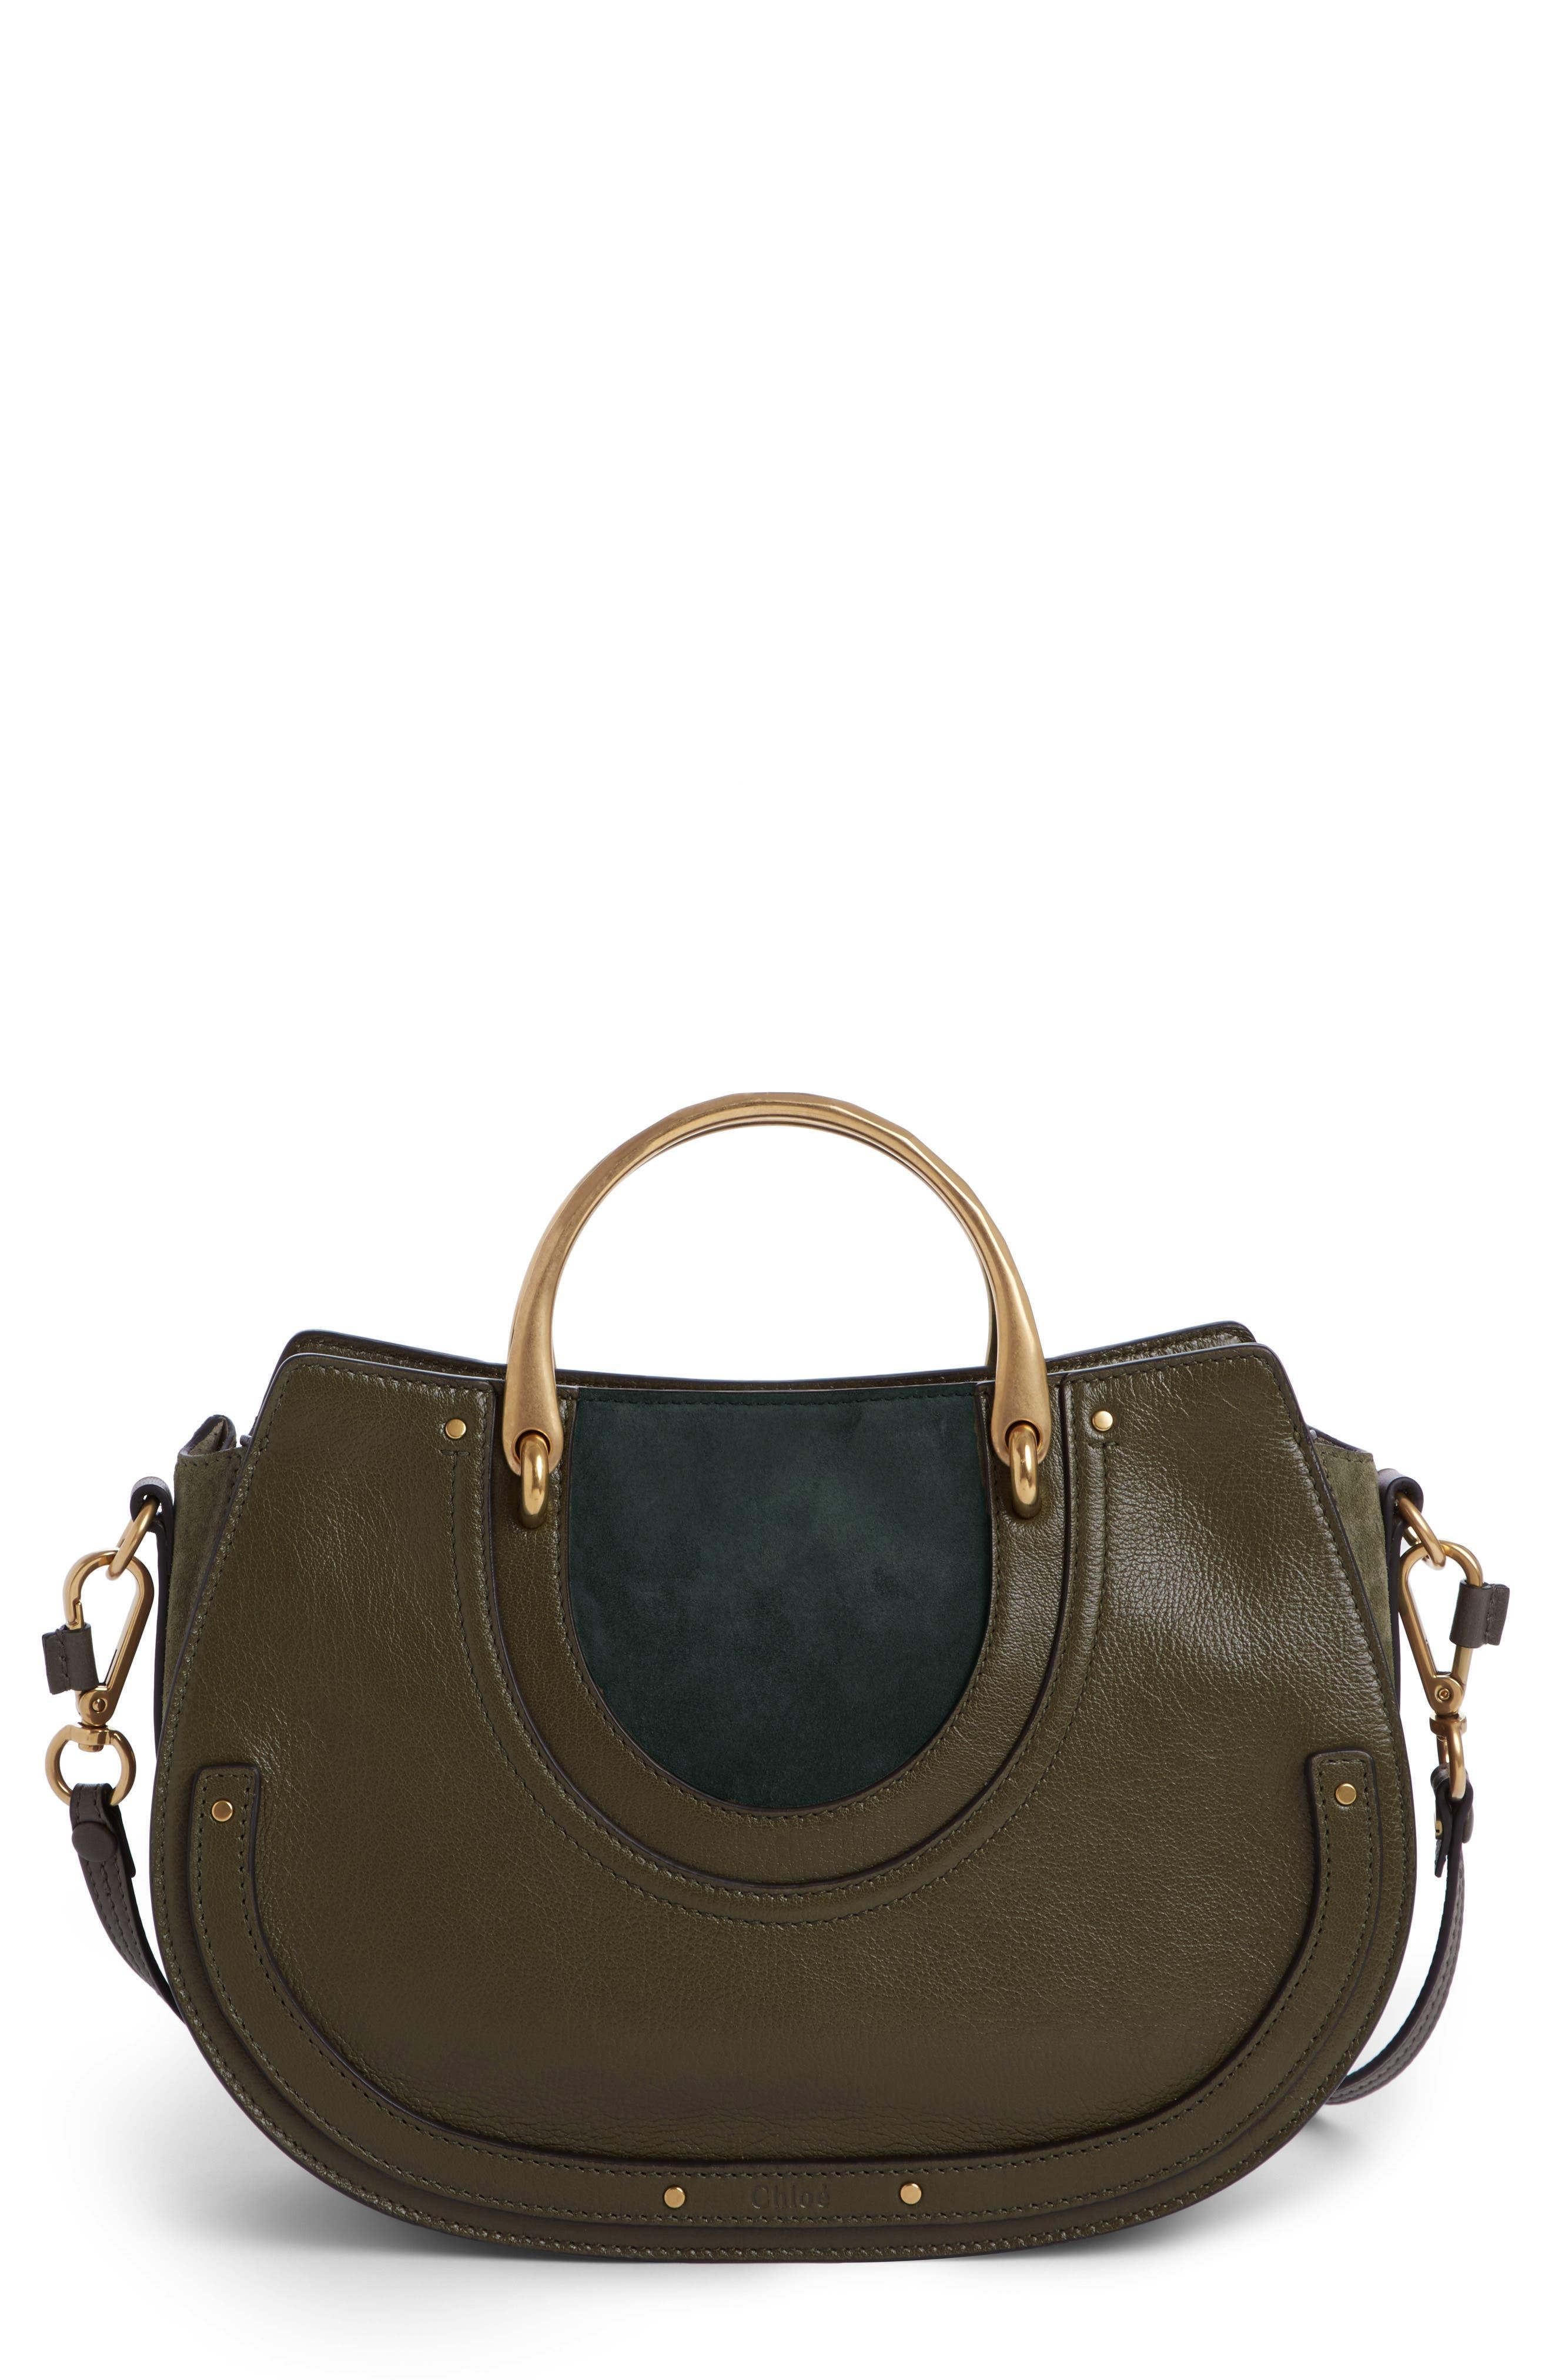 Medium Pixie Top Handle Leather Satchel,                         Main,                         color, Intense Green